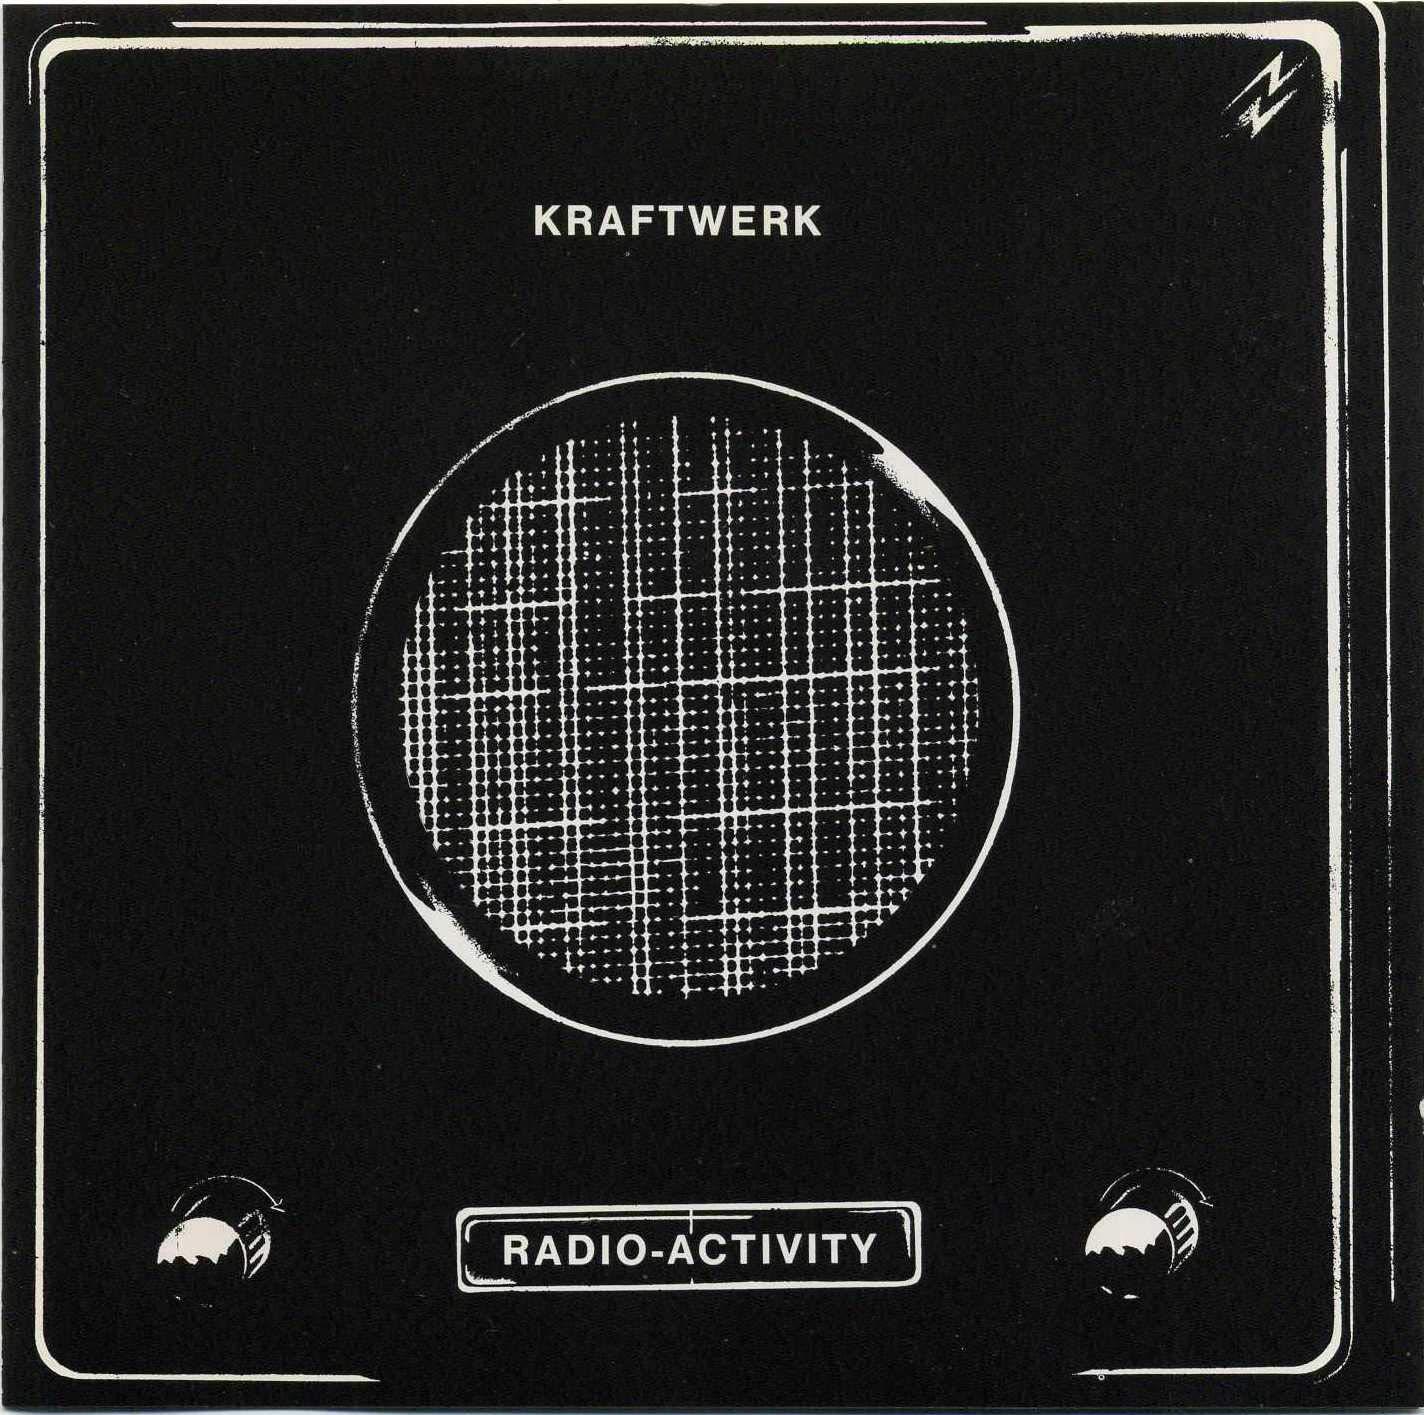 Marka, Gainsbourg, Kraftwerk-le Sens de l'Histoire-RadioActivity-Kraftwerk-Cover-ParisBazaar-Borde